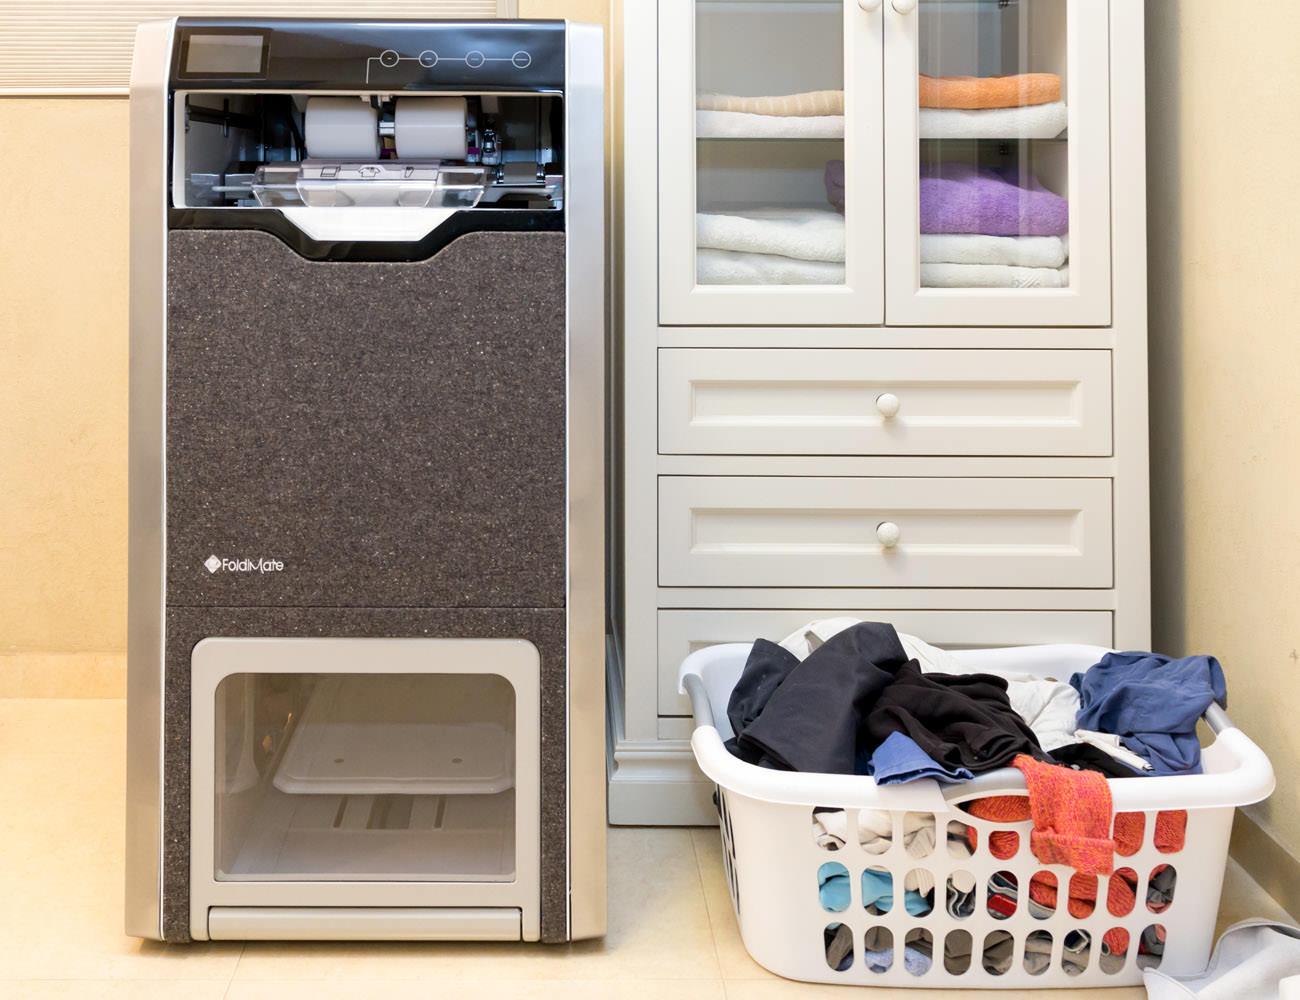 Foldimate Automatic Laundry Folding Robot 187 Gadget Flow